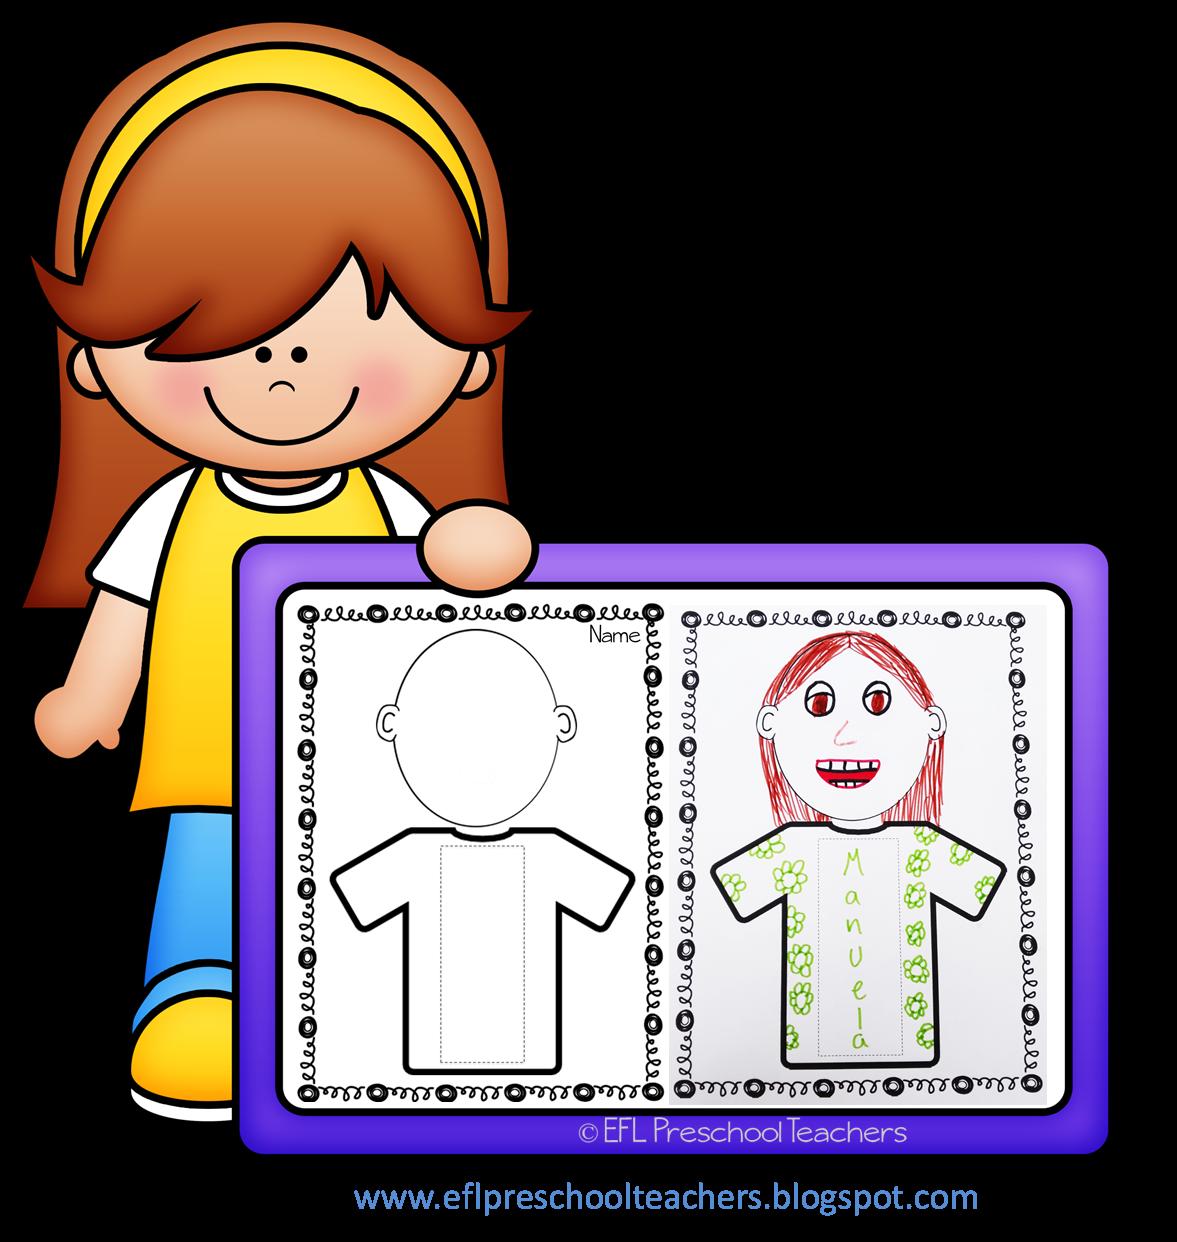 Esl Efl Preschool Teachers Name Worksheets For Preschool Ela